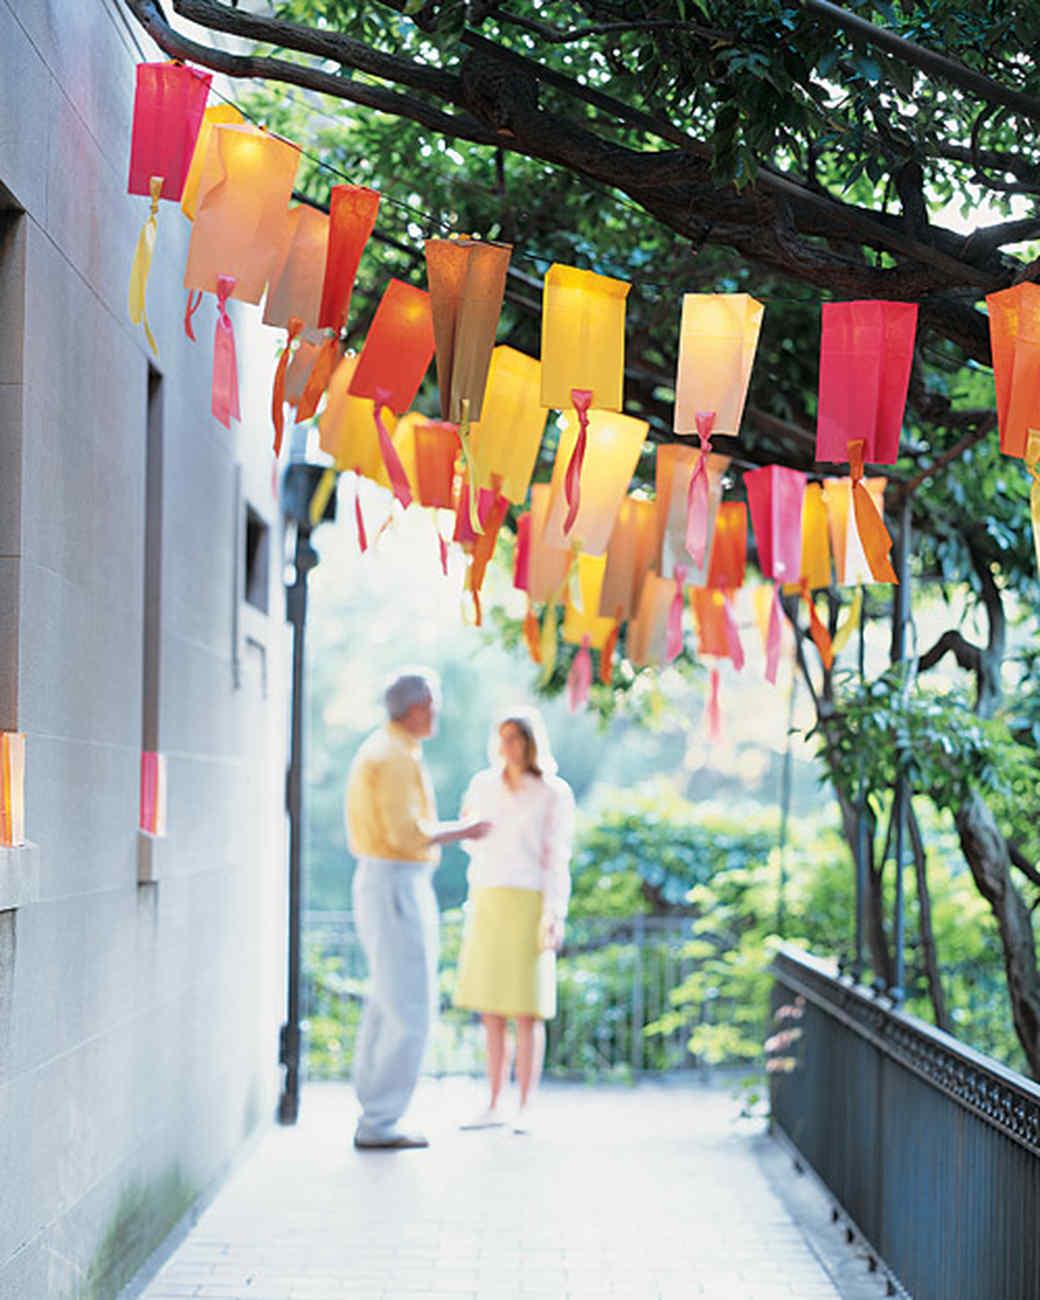 Paper-Bag Party Lights